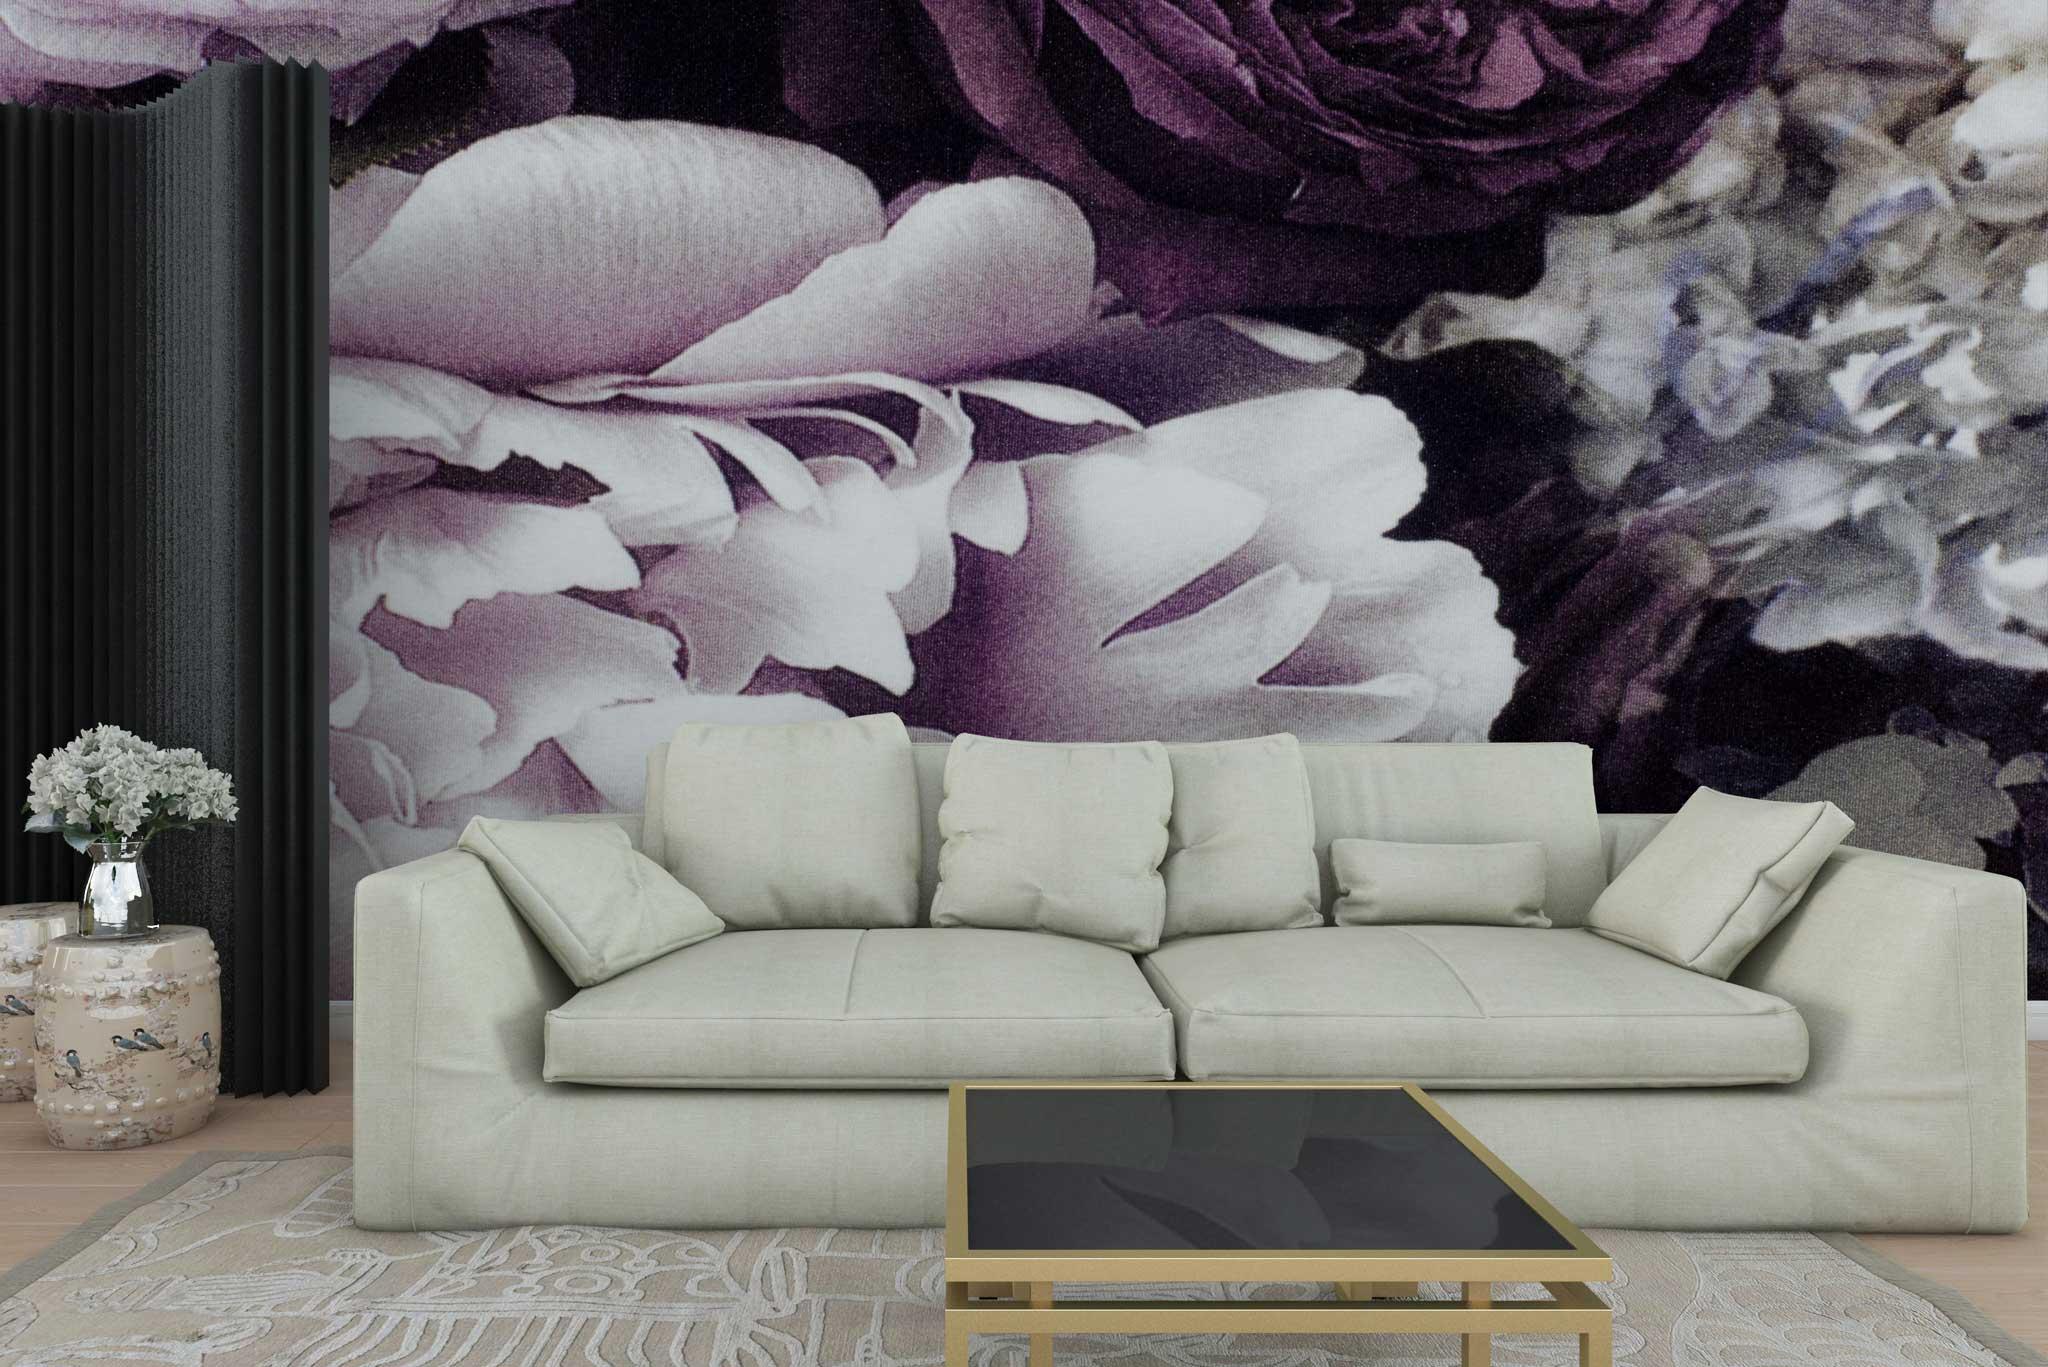 tapet-fototapet-personalizat-comanda-bucuresti-model-floral-fotografie-bujori-roz-perete-lux-special